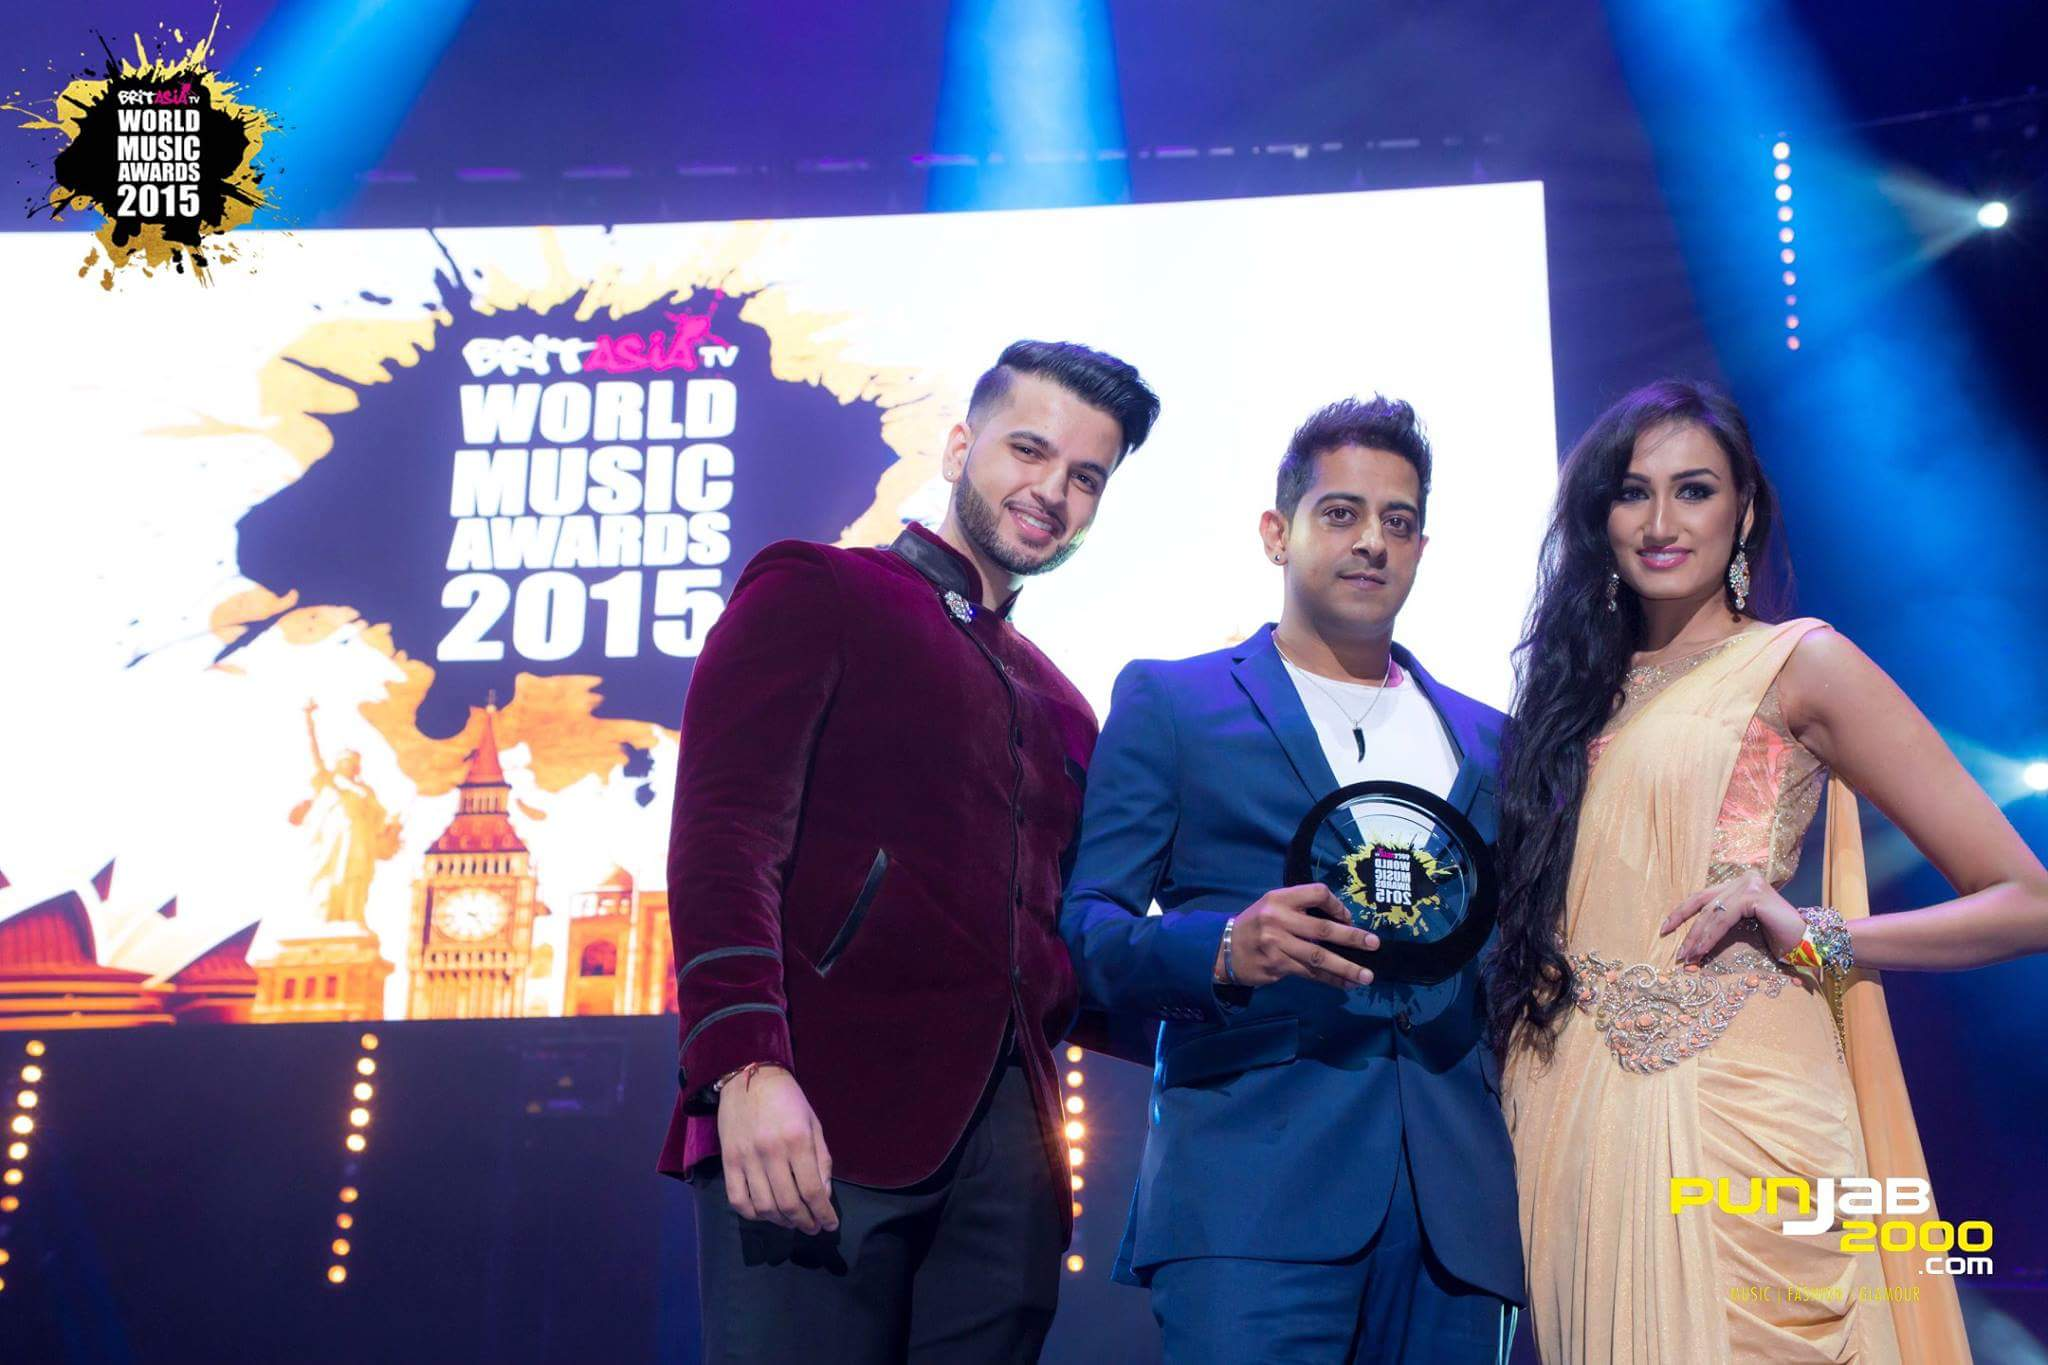 DJ Vix winning best album at BritAsia TV World Music Awards 2015